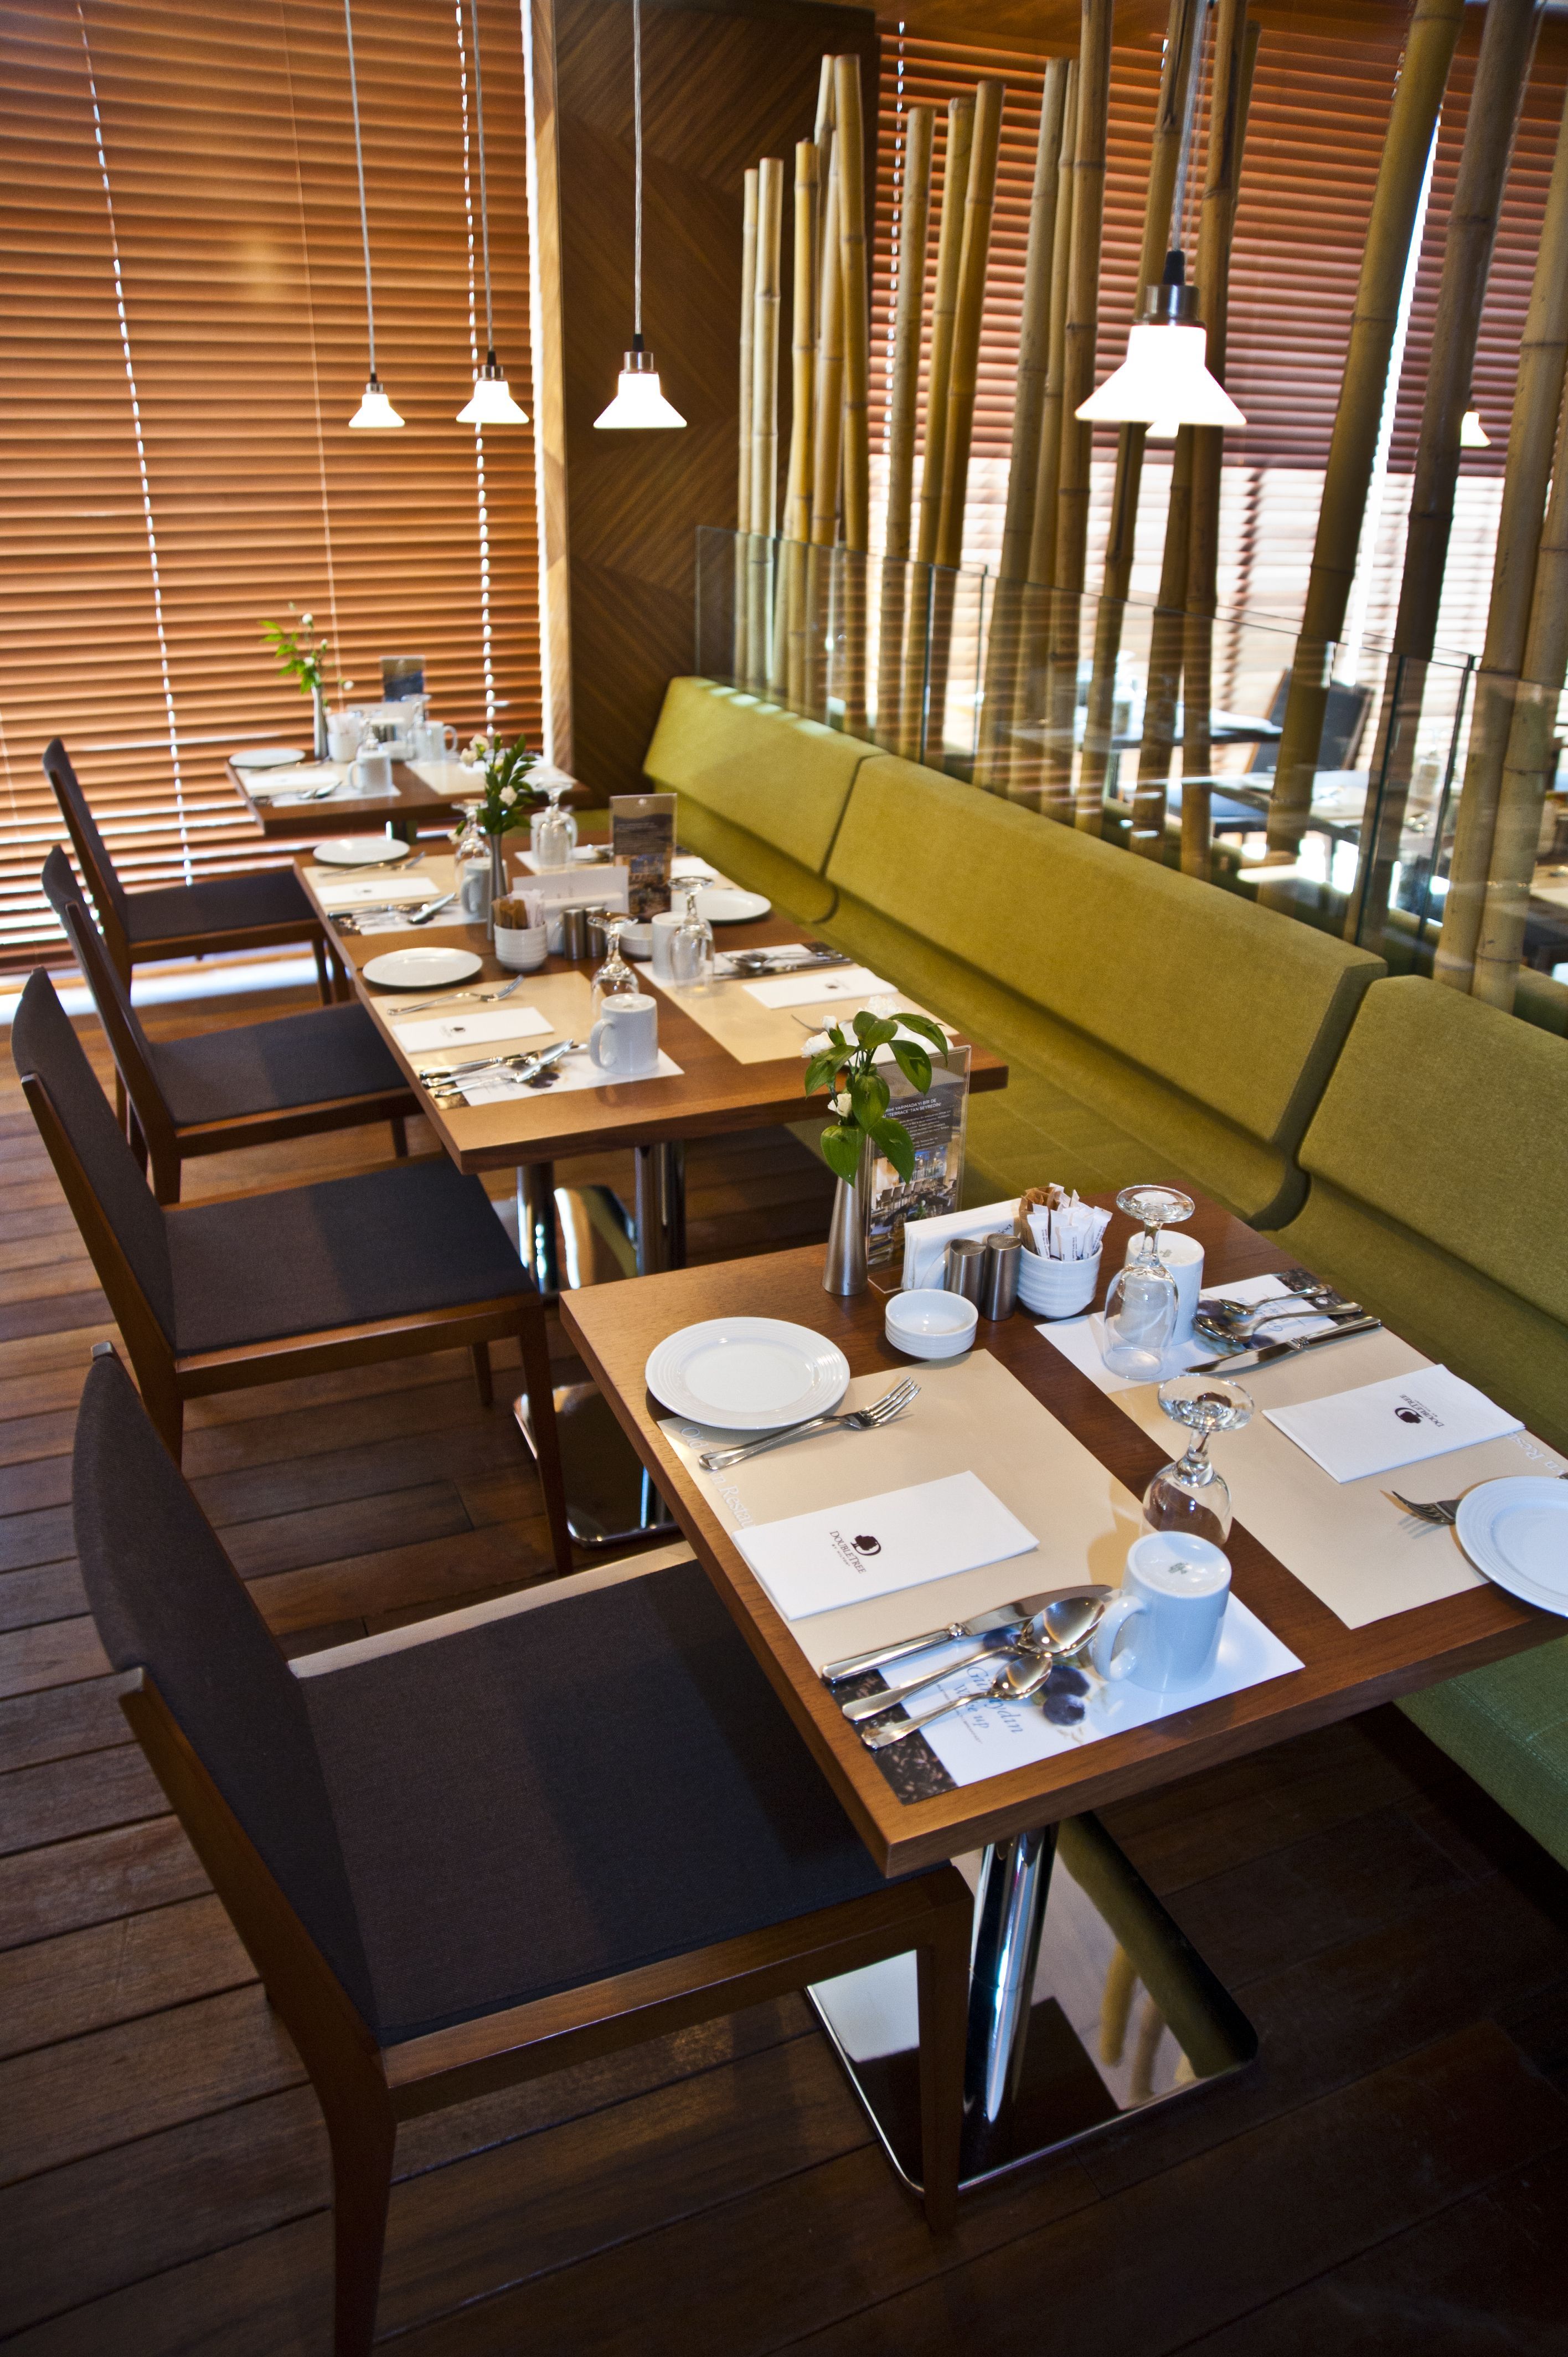 Modern Dining Chair Modern Restaurant Dining Chair Wood Dining